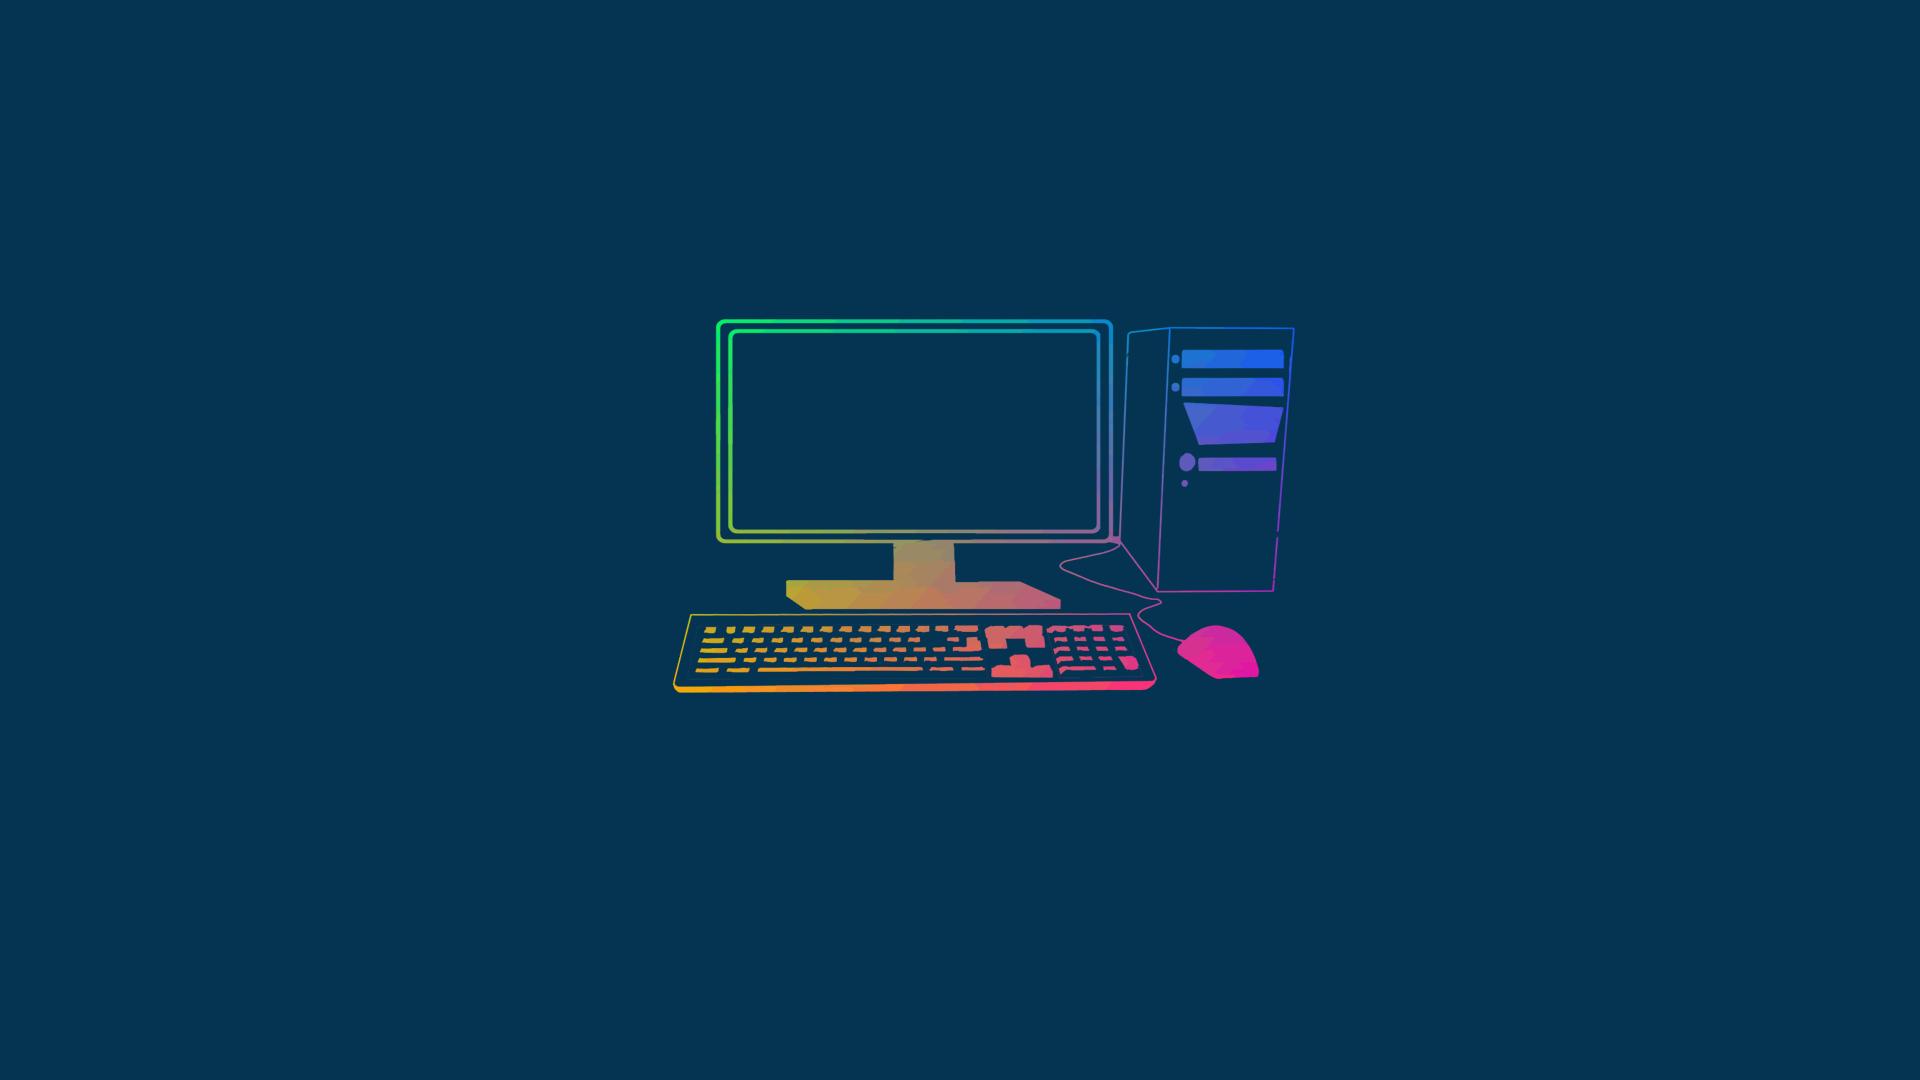 Computer wallpaper desktop hd